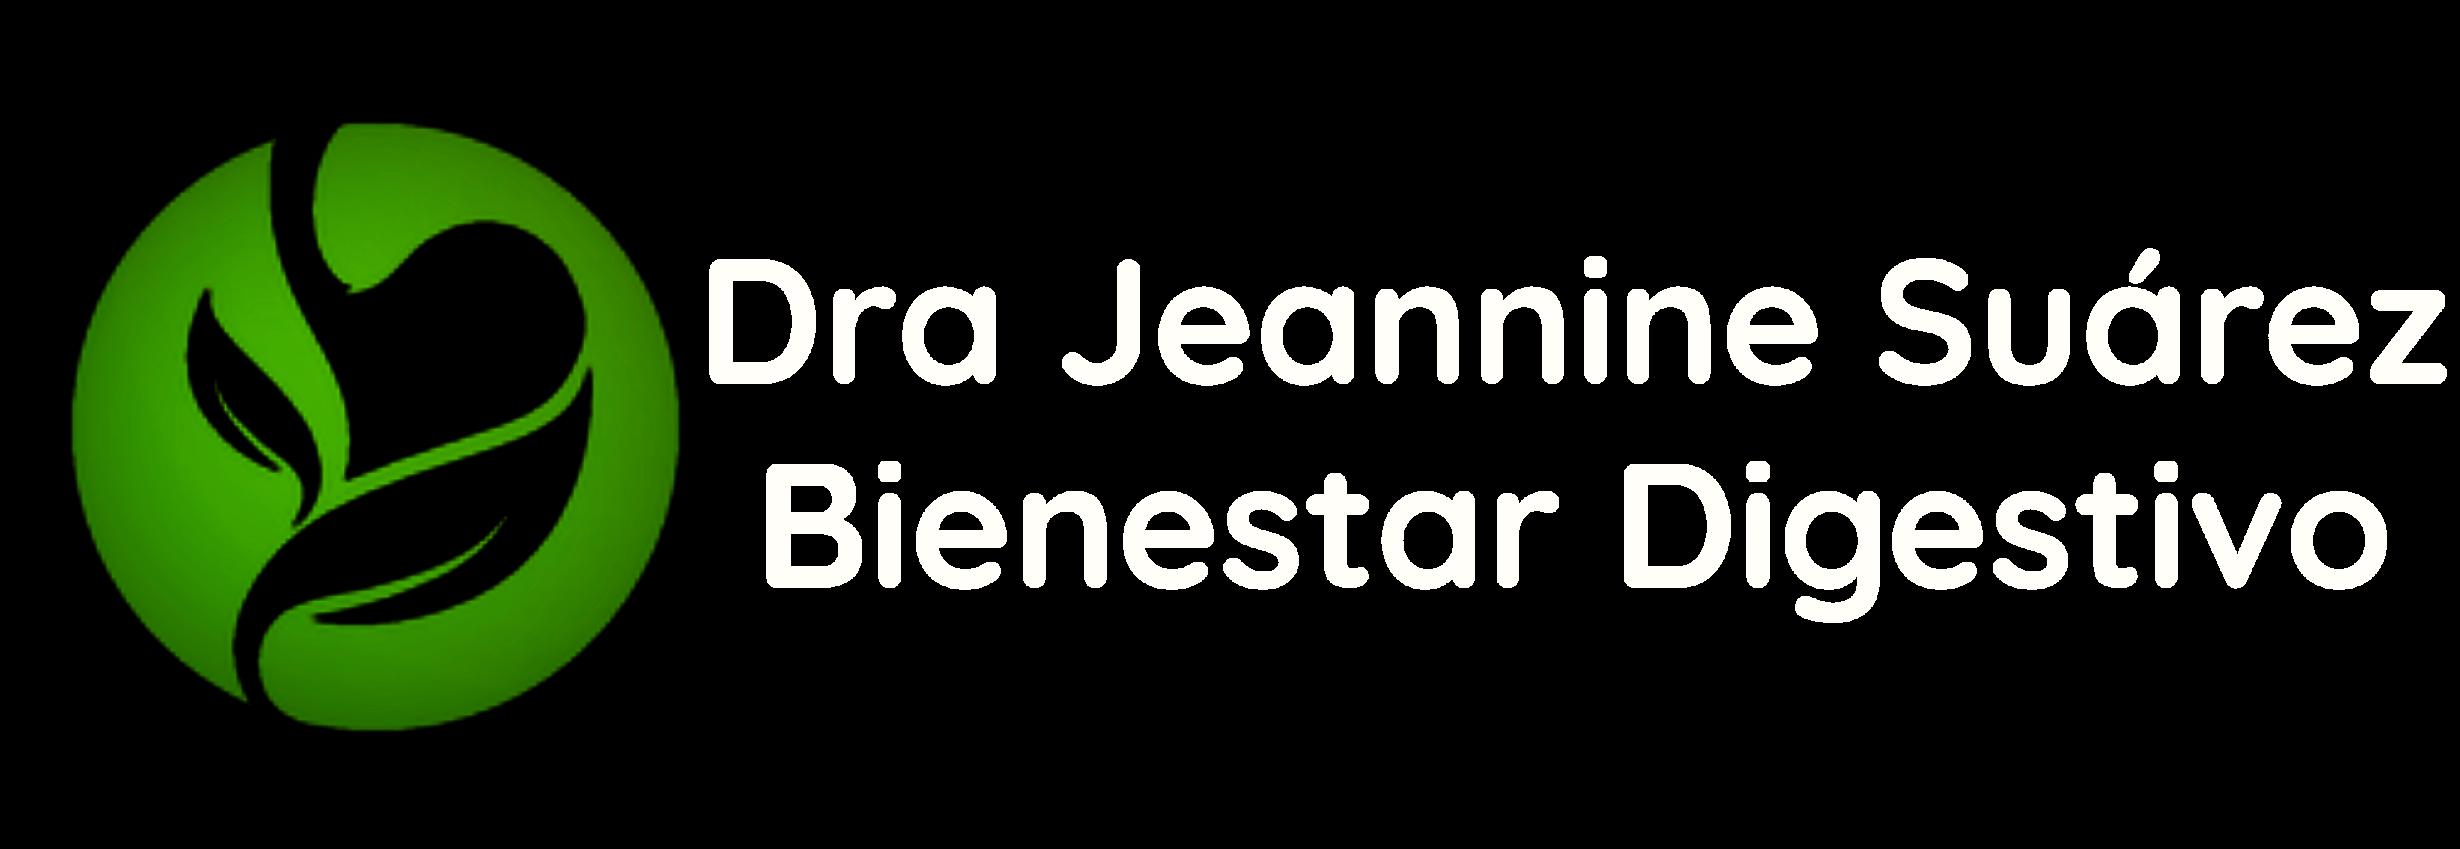 Bienestar Digestivo Dra. Jeannine Suarez